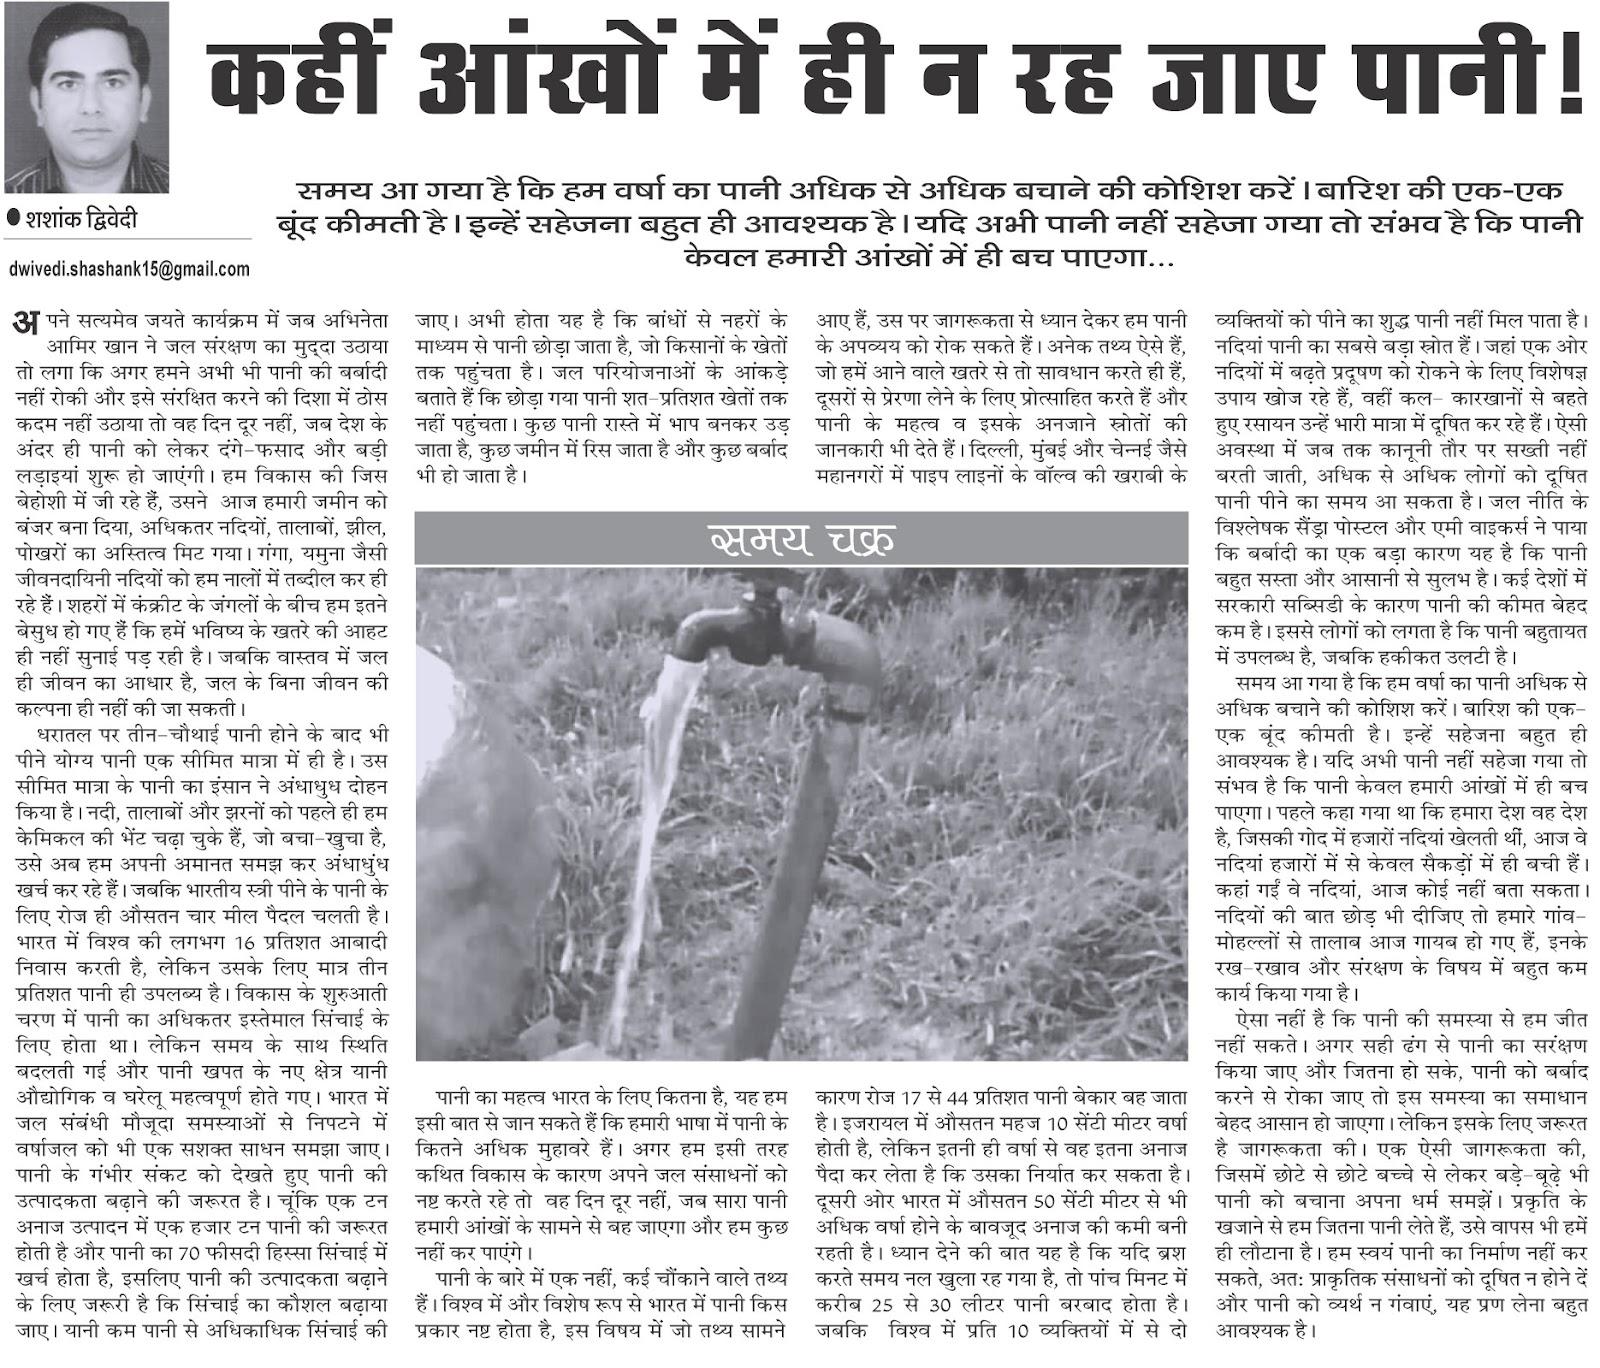 jal sanrakshan essay in hindi स्वच्छ भारत मिशन पर निबंध – essay on swachh bharat mission jal sanrakshan kavita in hindi.